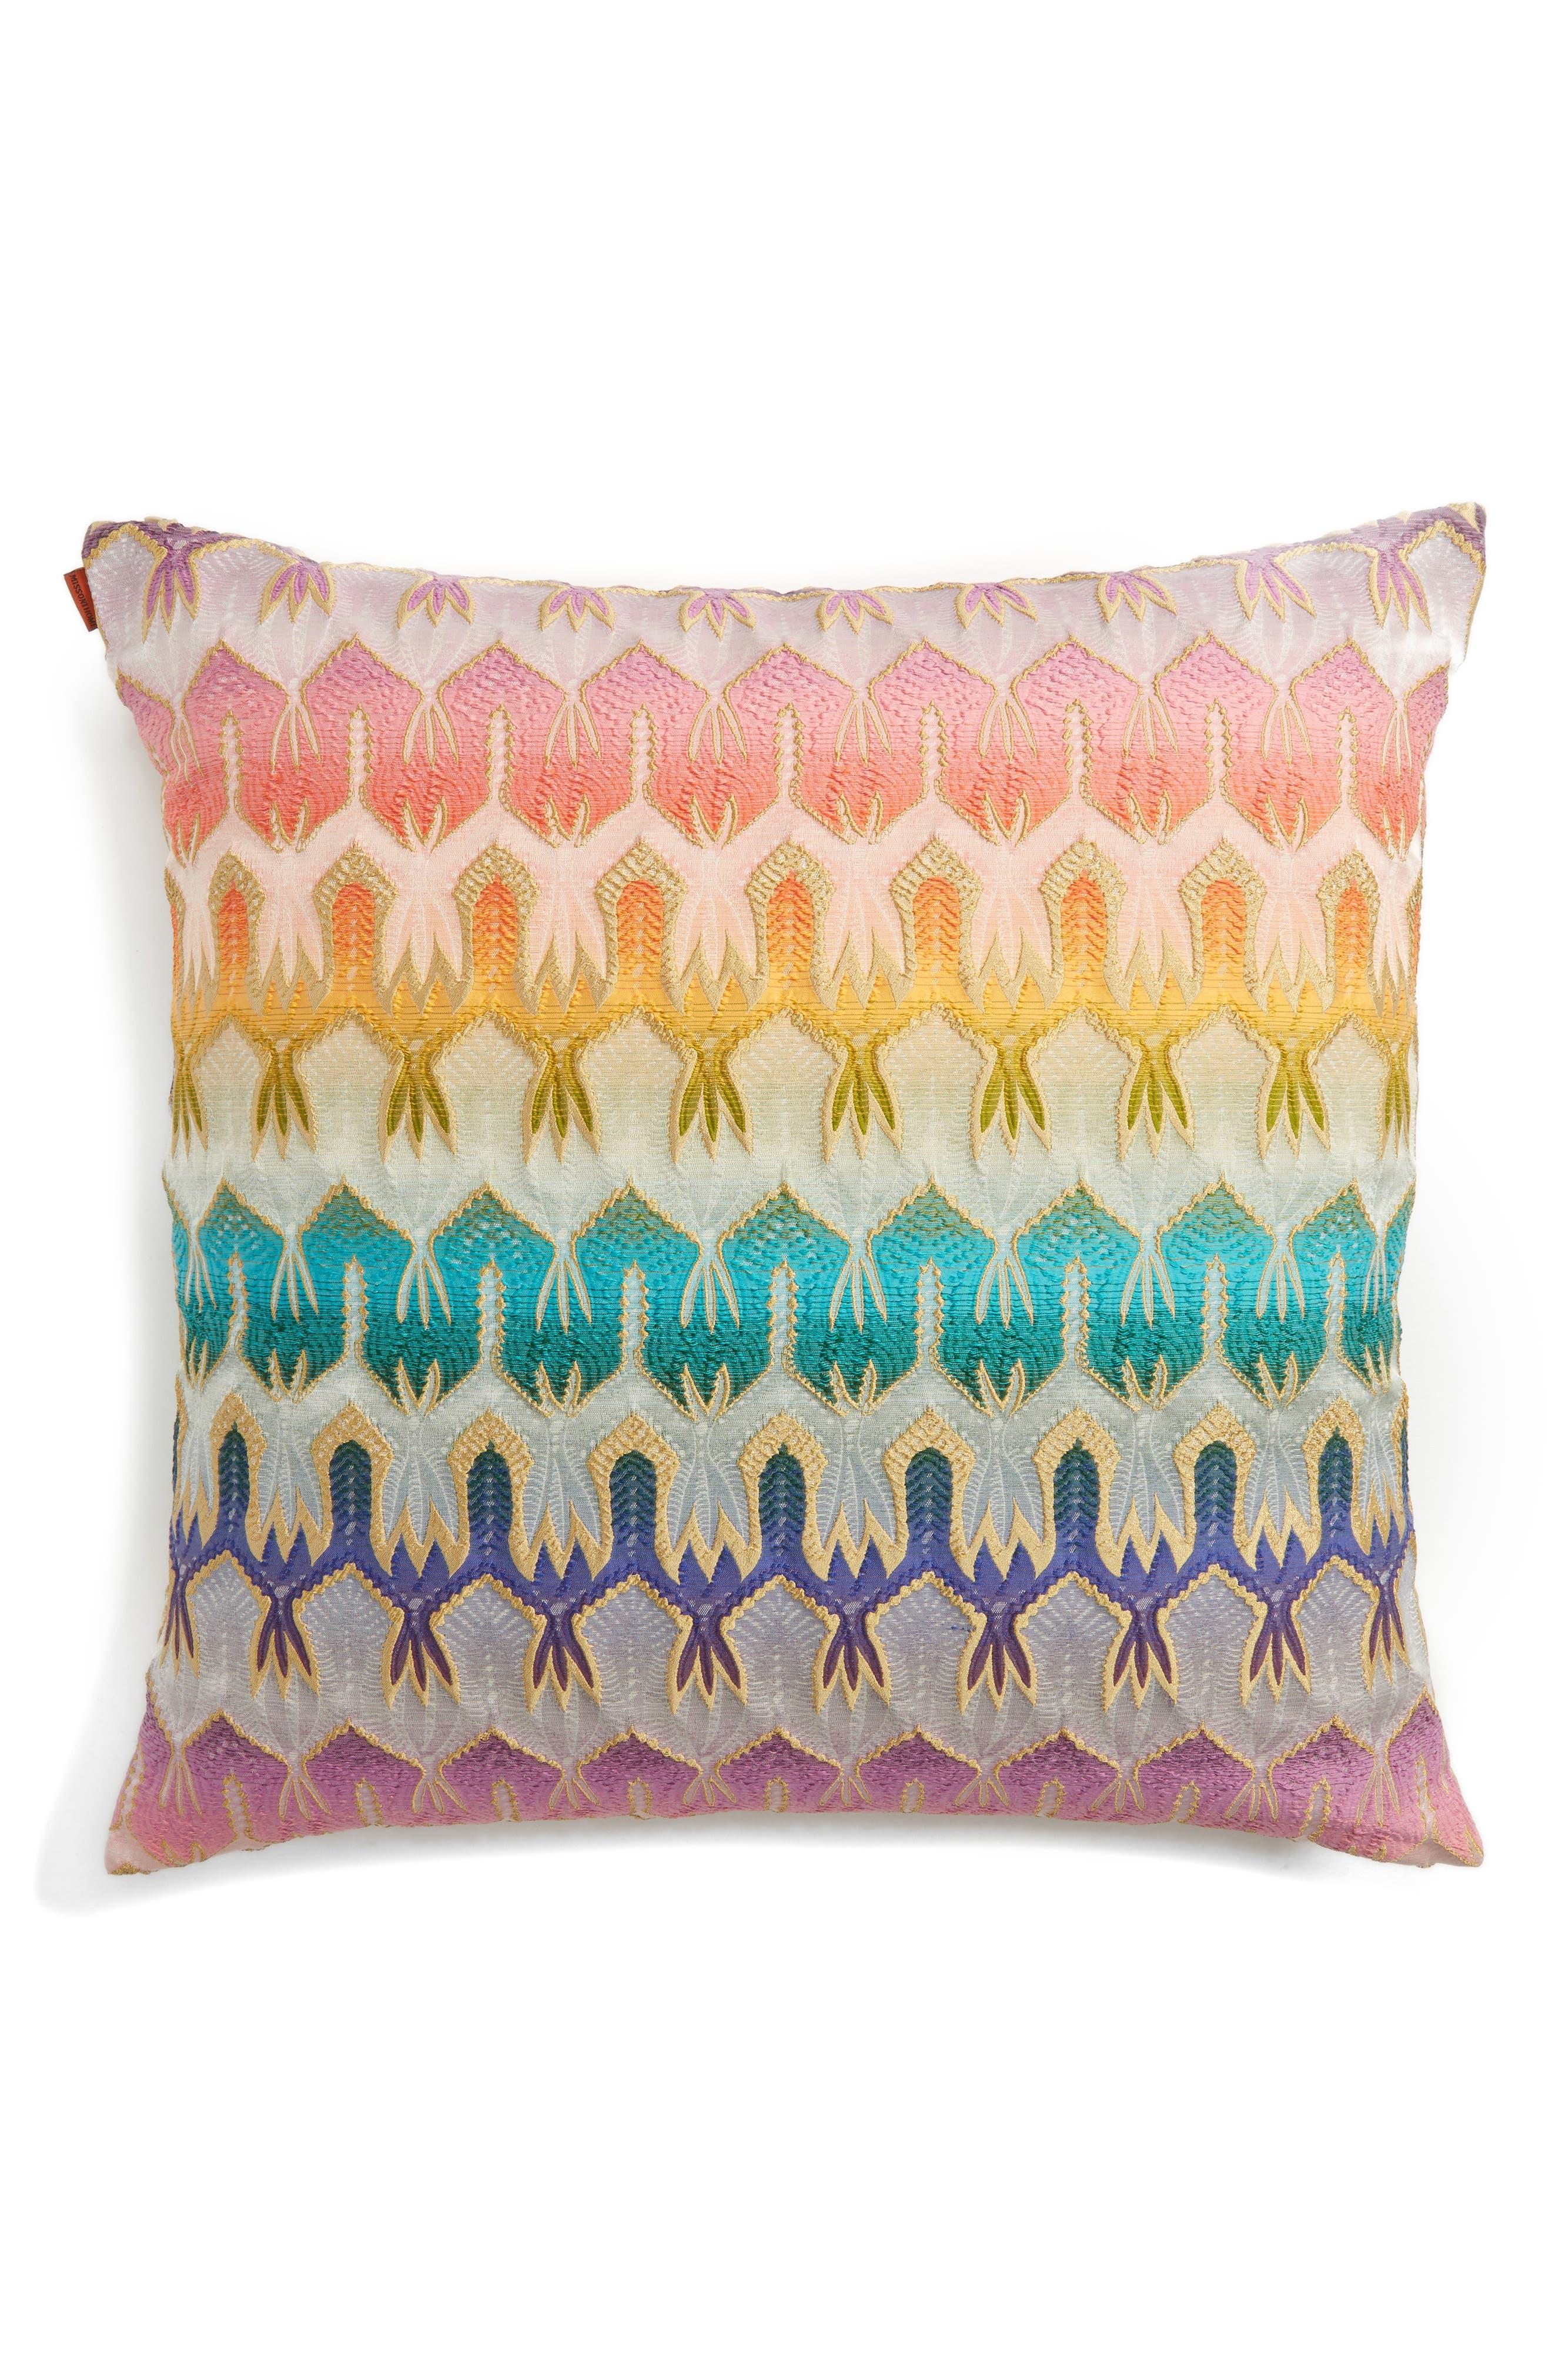 Pasadena Accent Pillow,                         Main,                         color, Multi Color